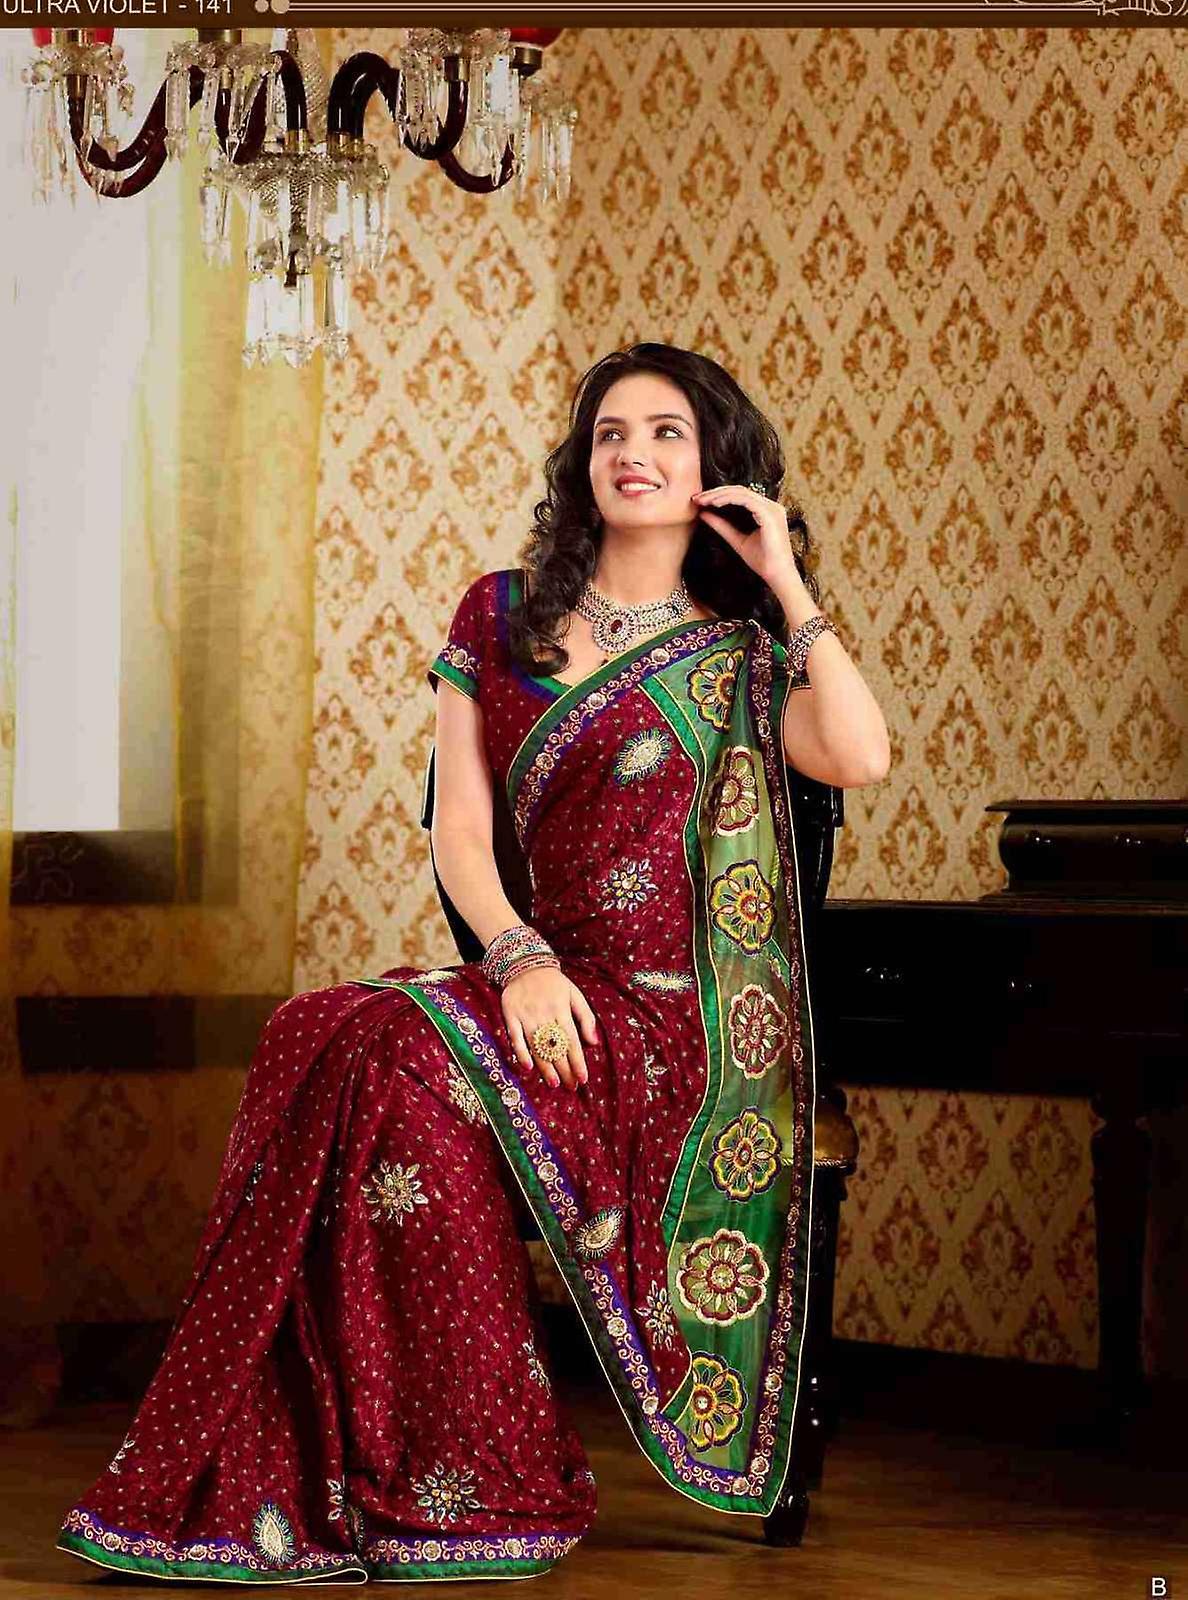 Deepshika Maroon Faux Crepe Luxus Party tragen Sari saree